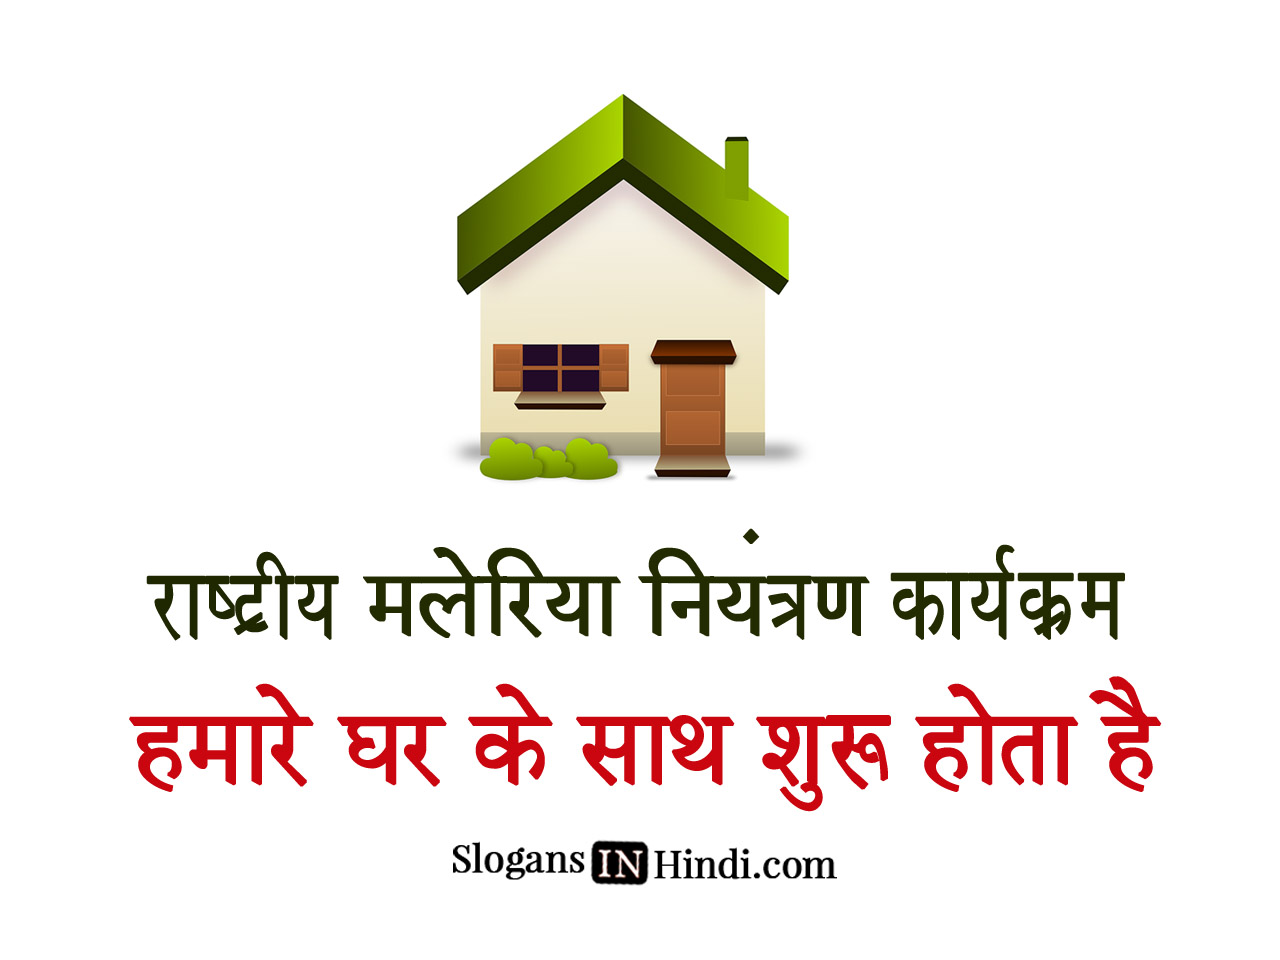 Malaria Slogans In Hindi